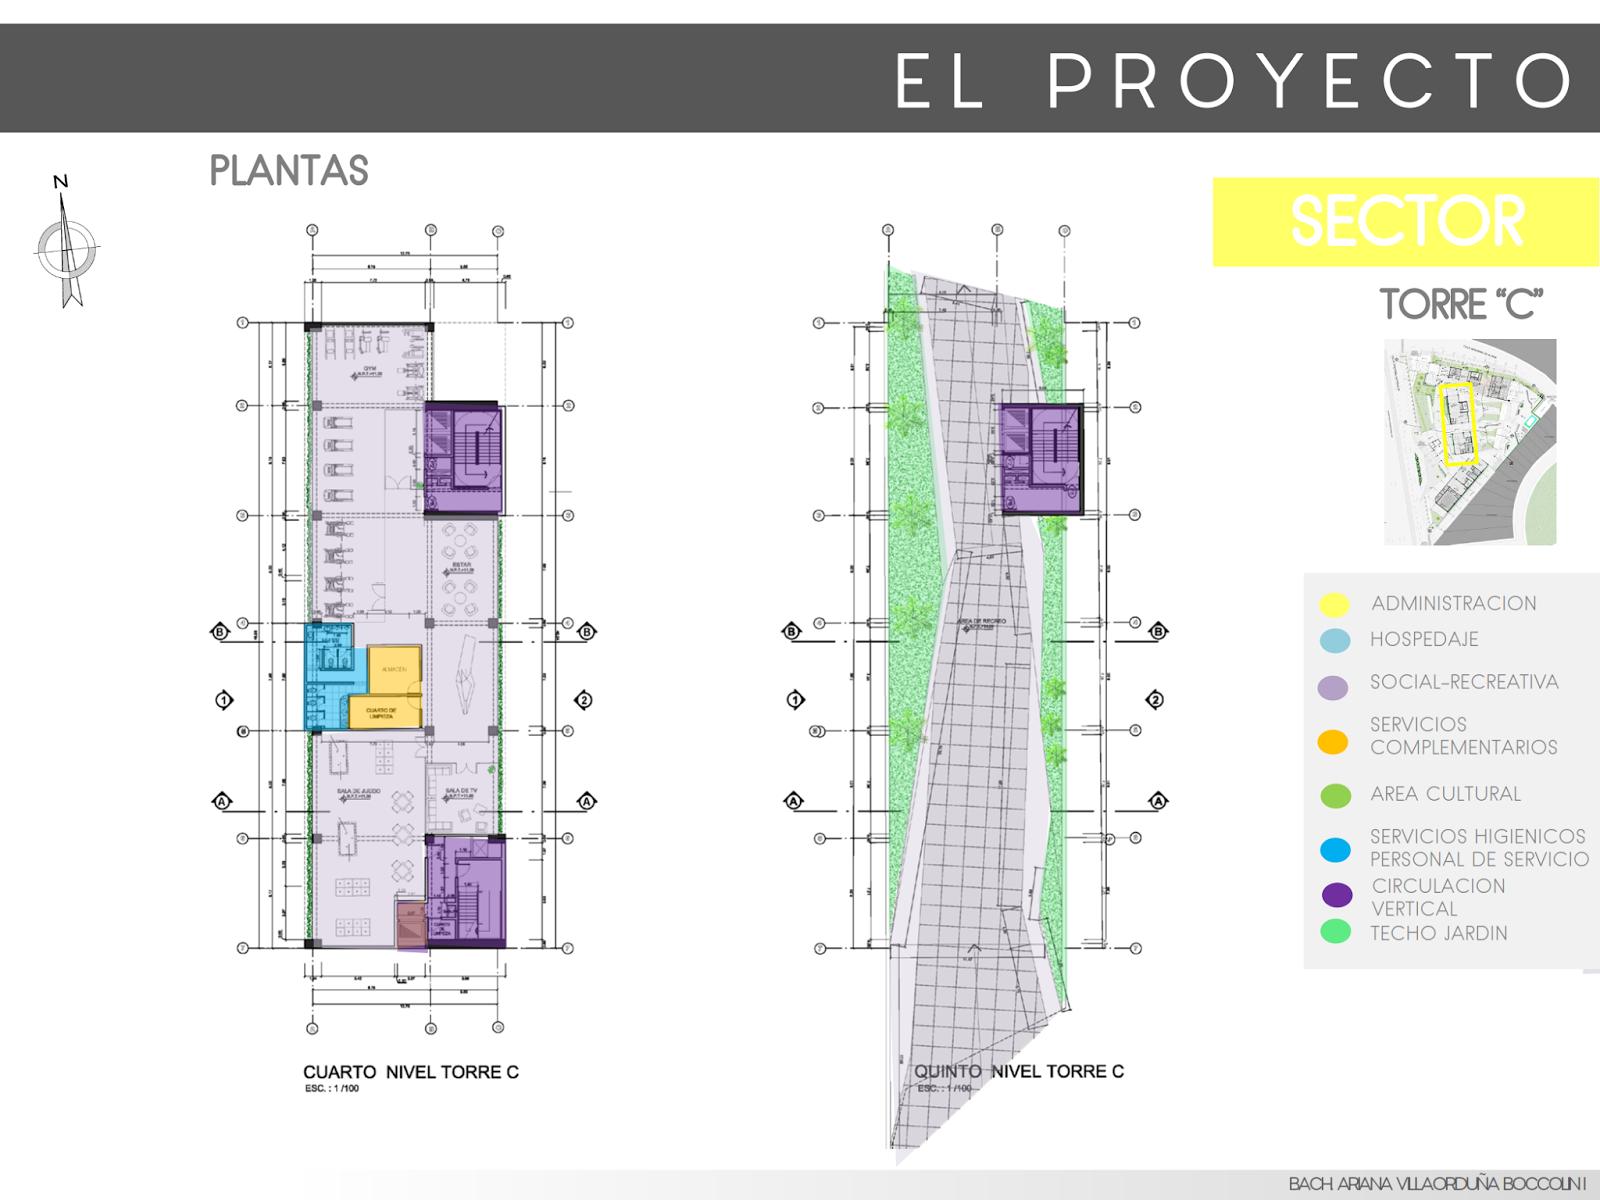 Apuntes revista digital de arquitectura tesis for Grado superior arquitectura